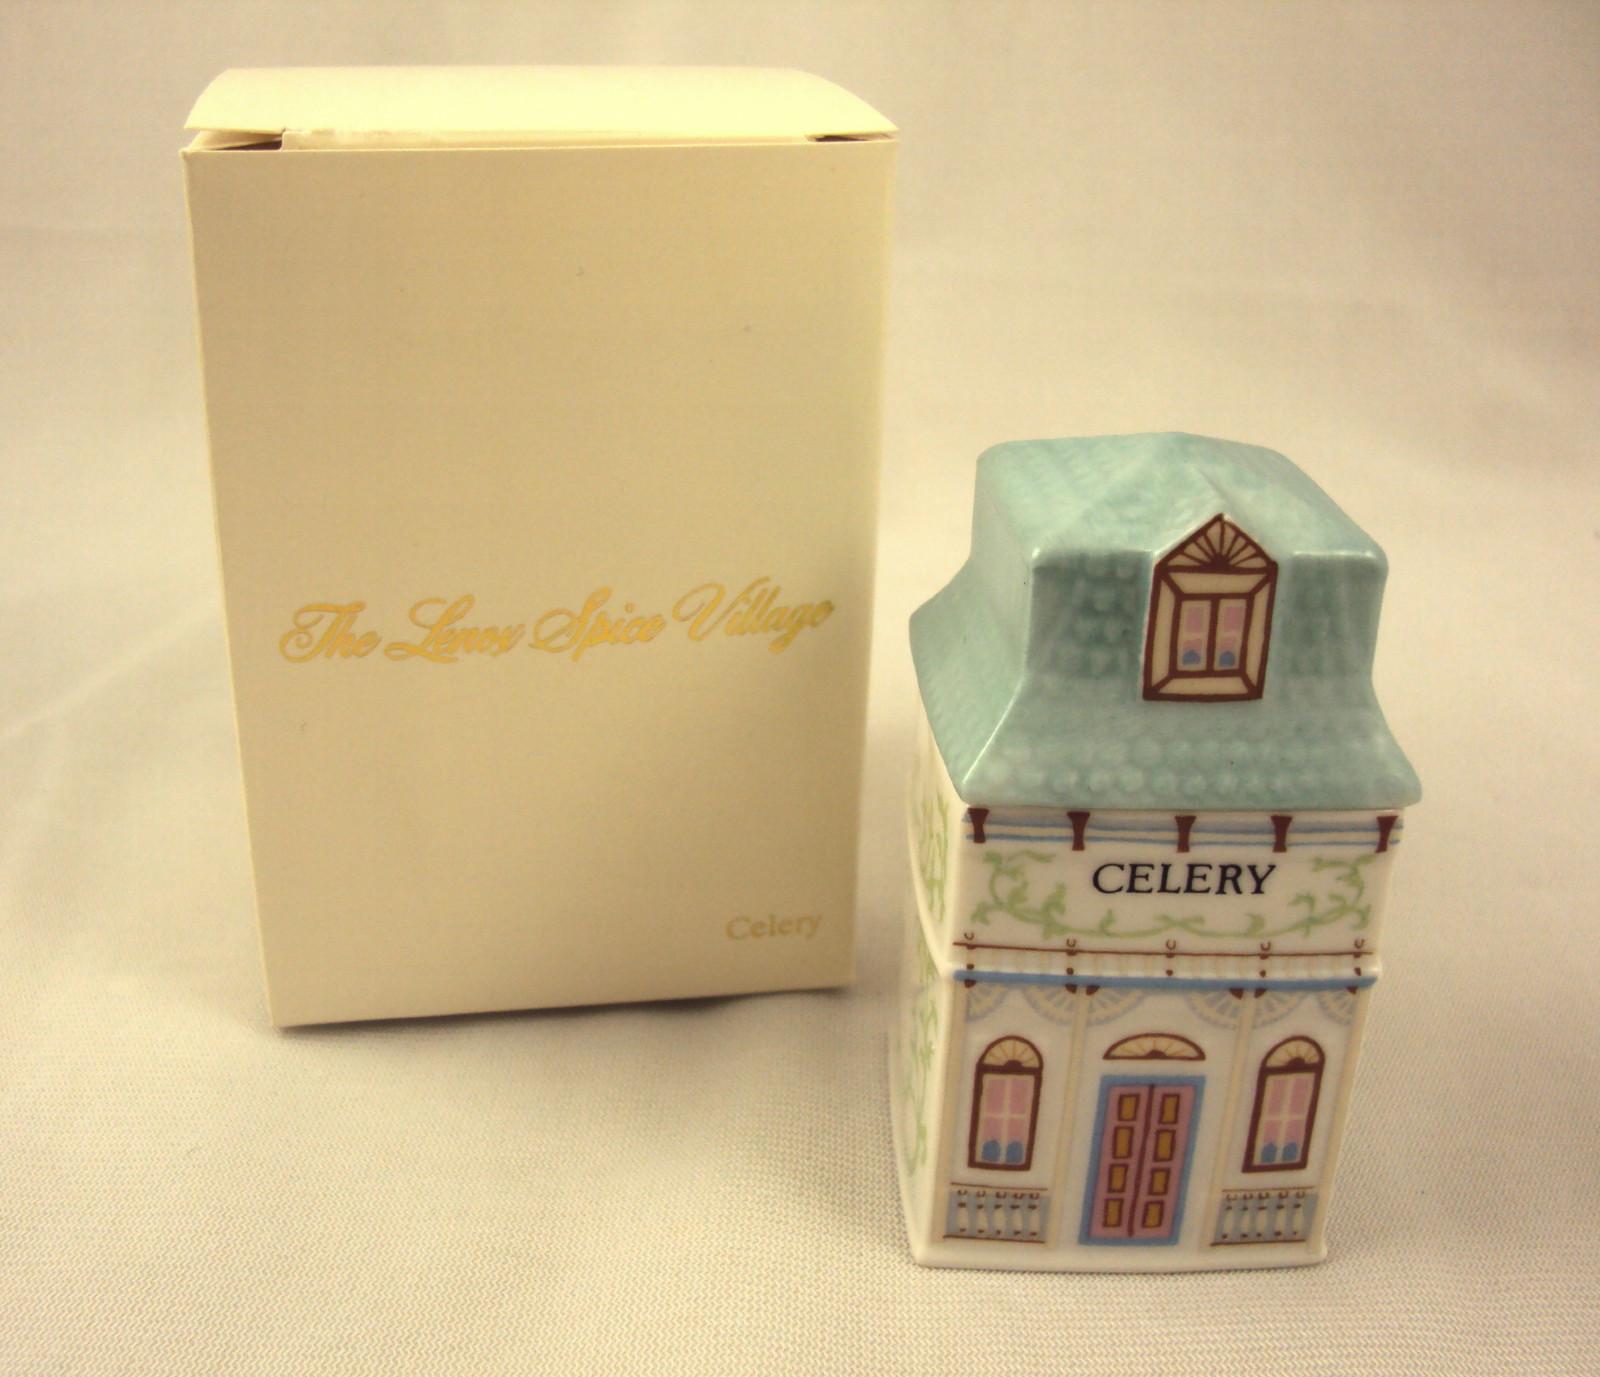 Lenox Spice Village Celery Spice Jar 1989 Vintage Victorian NIB Free Shipping - $19.95